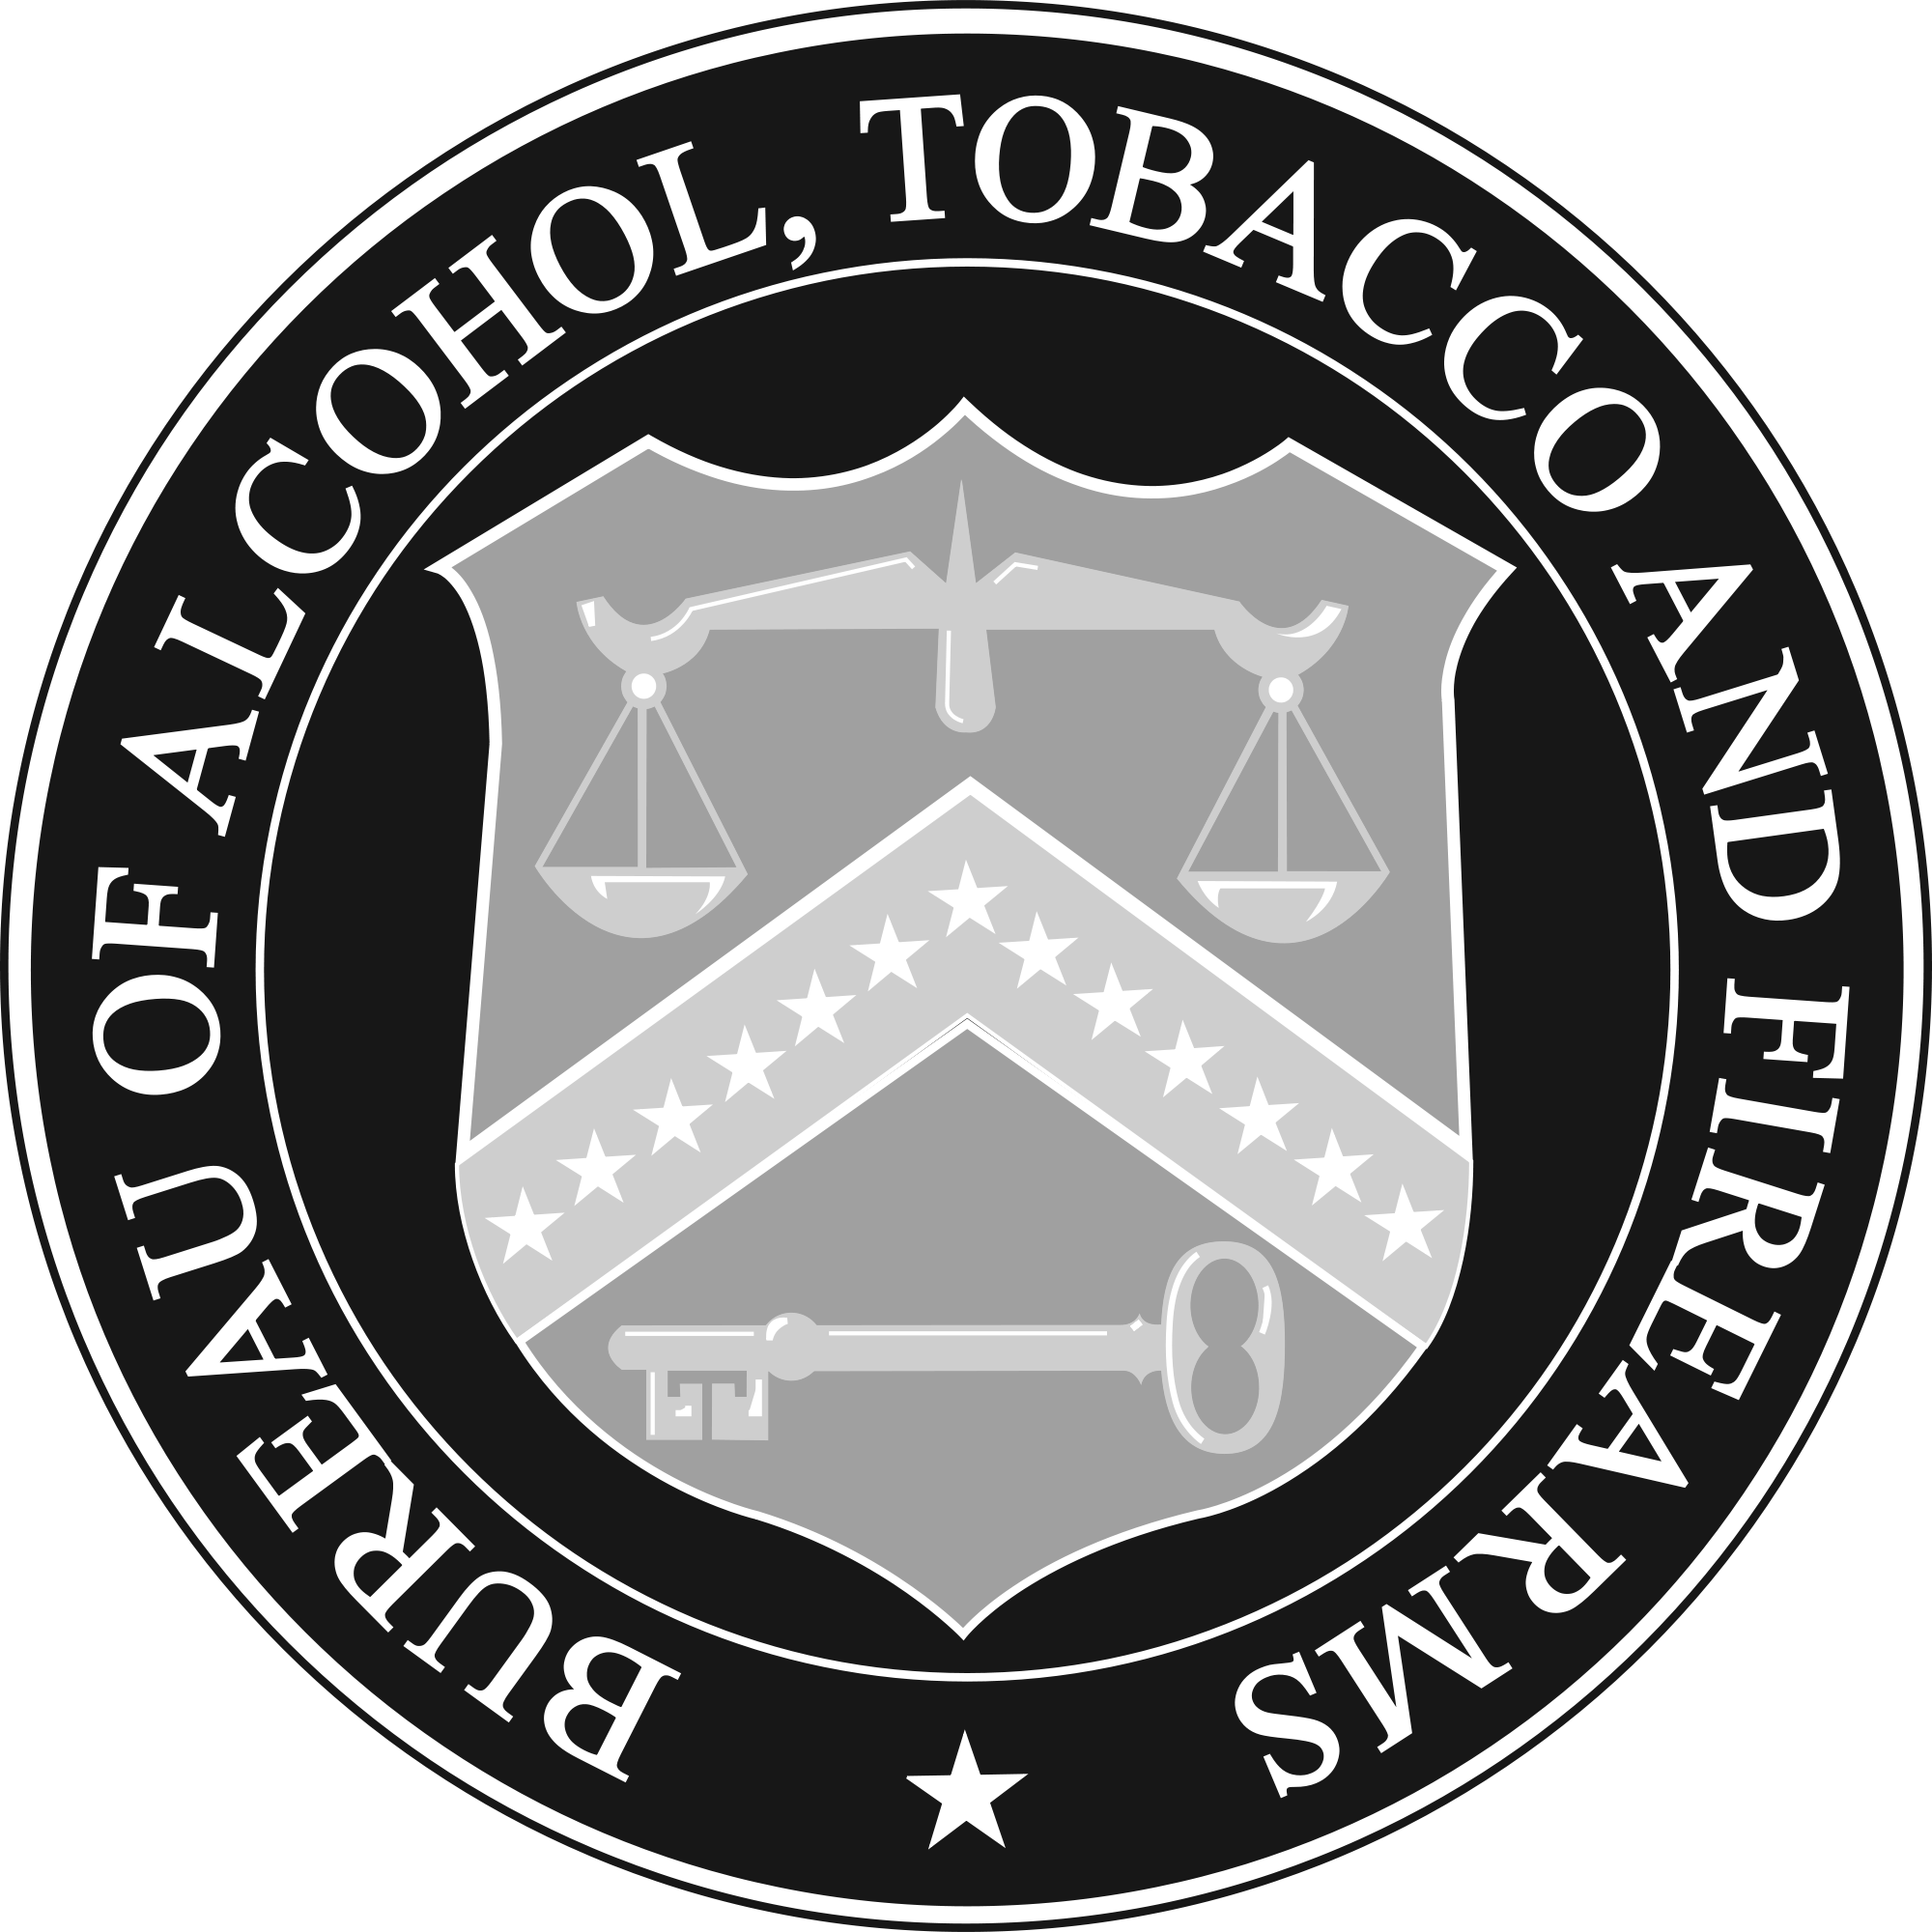 Bureau of Alcohol, Tobacco, Firearms, and Explosives (BATFE)